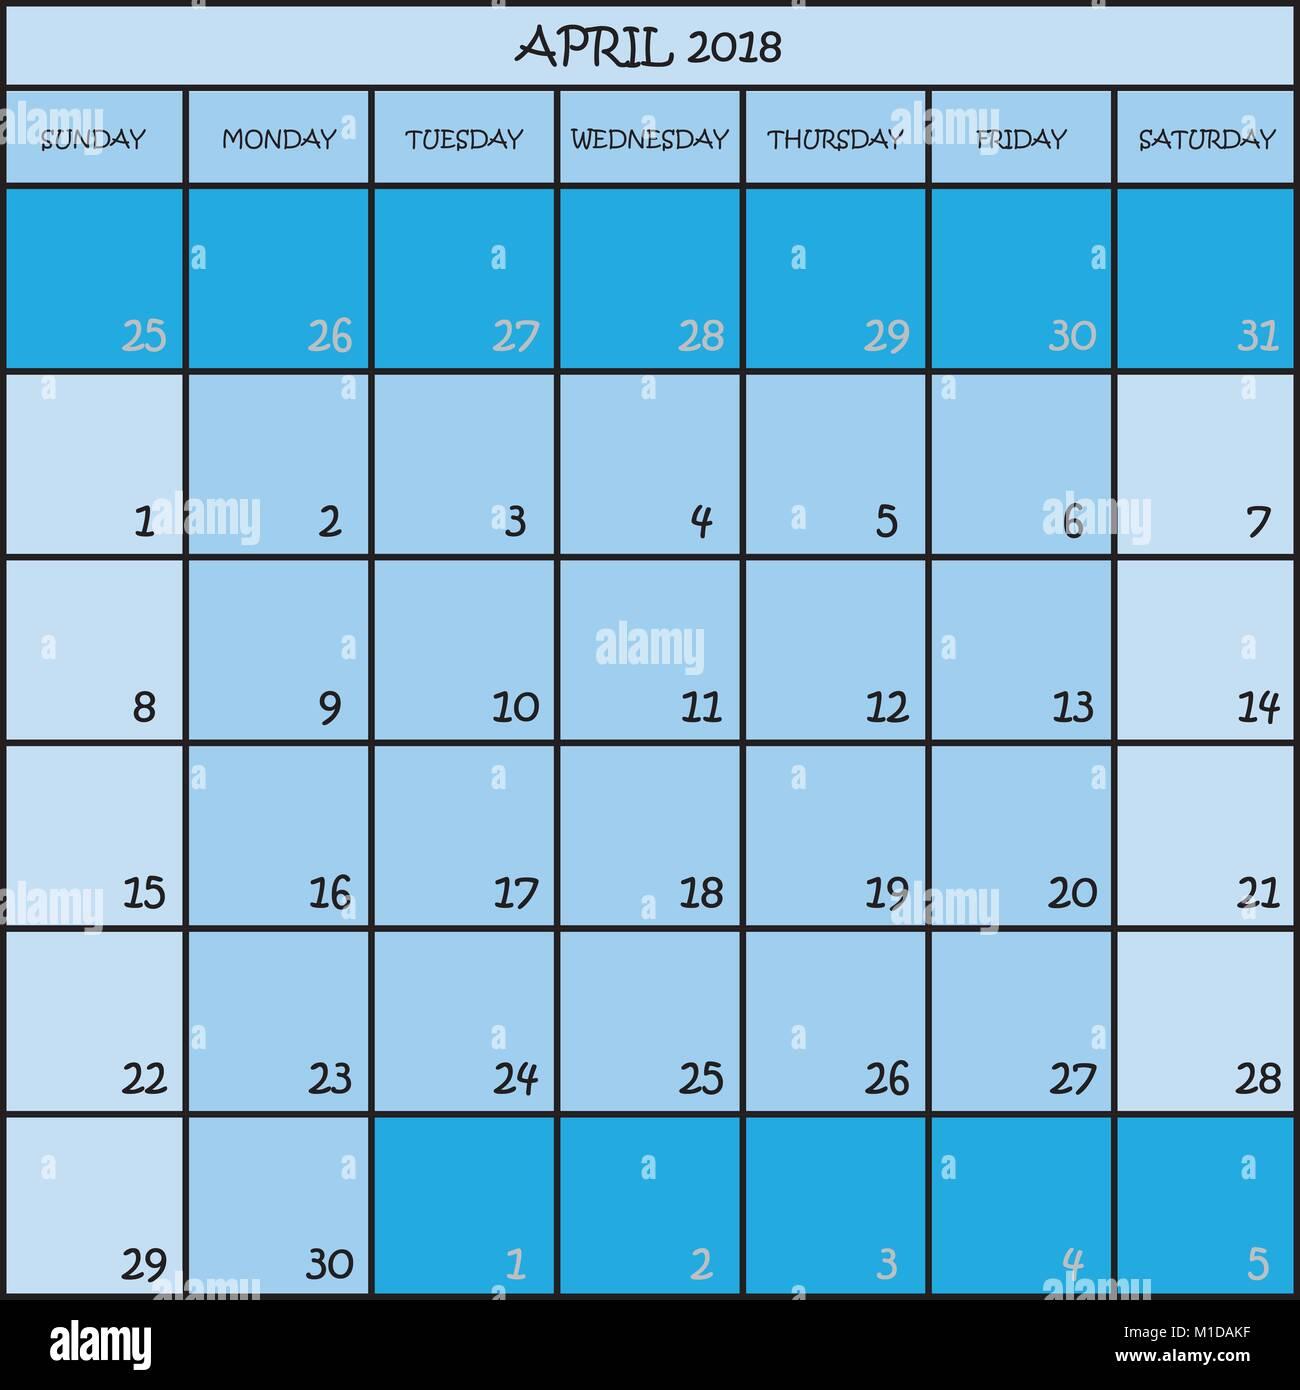 calendar month april 2018